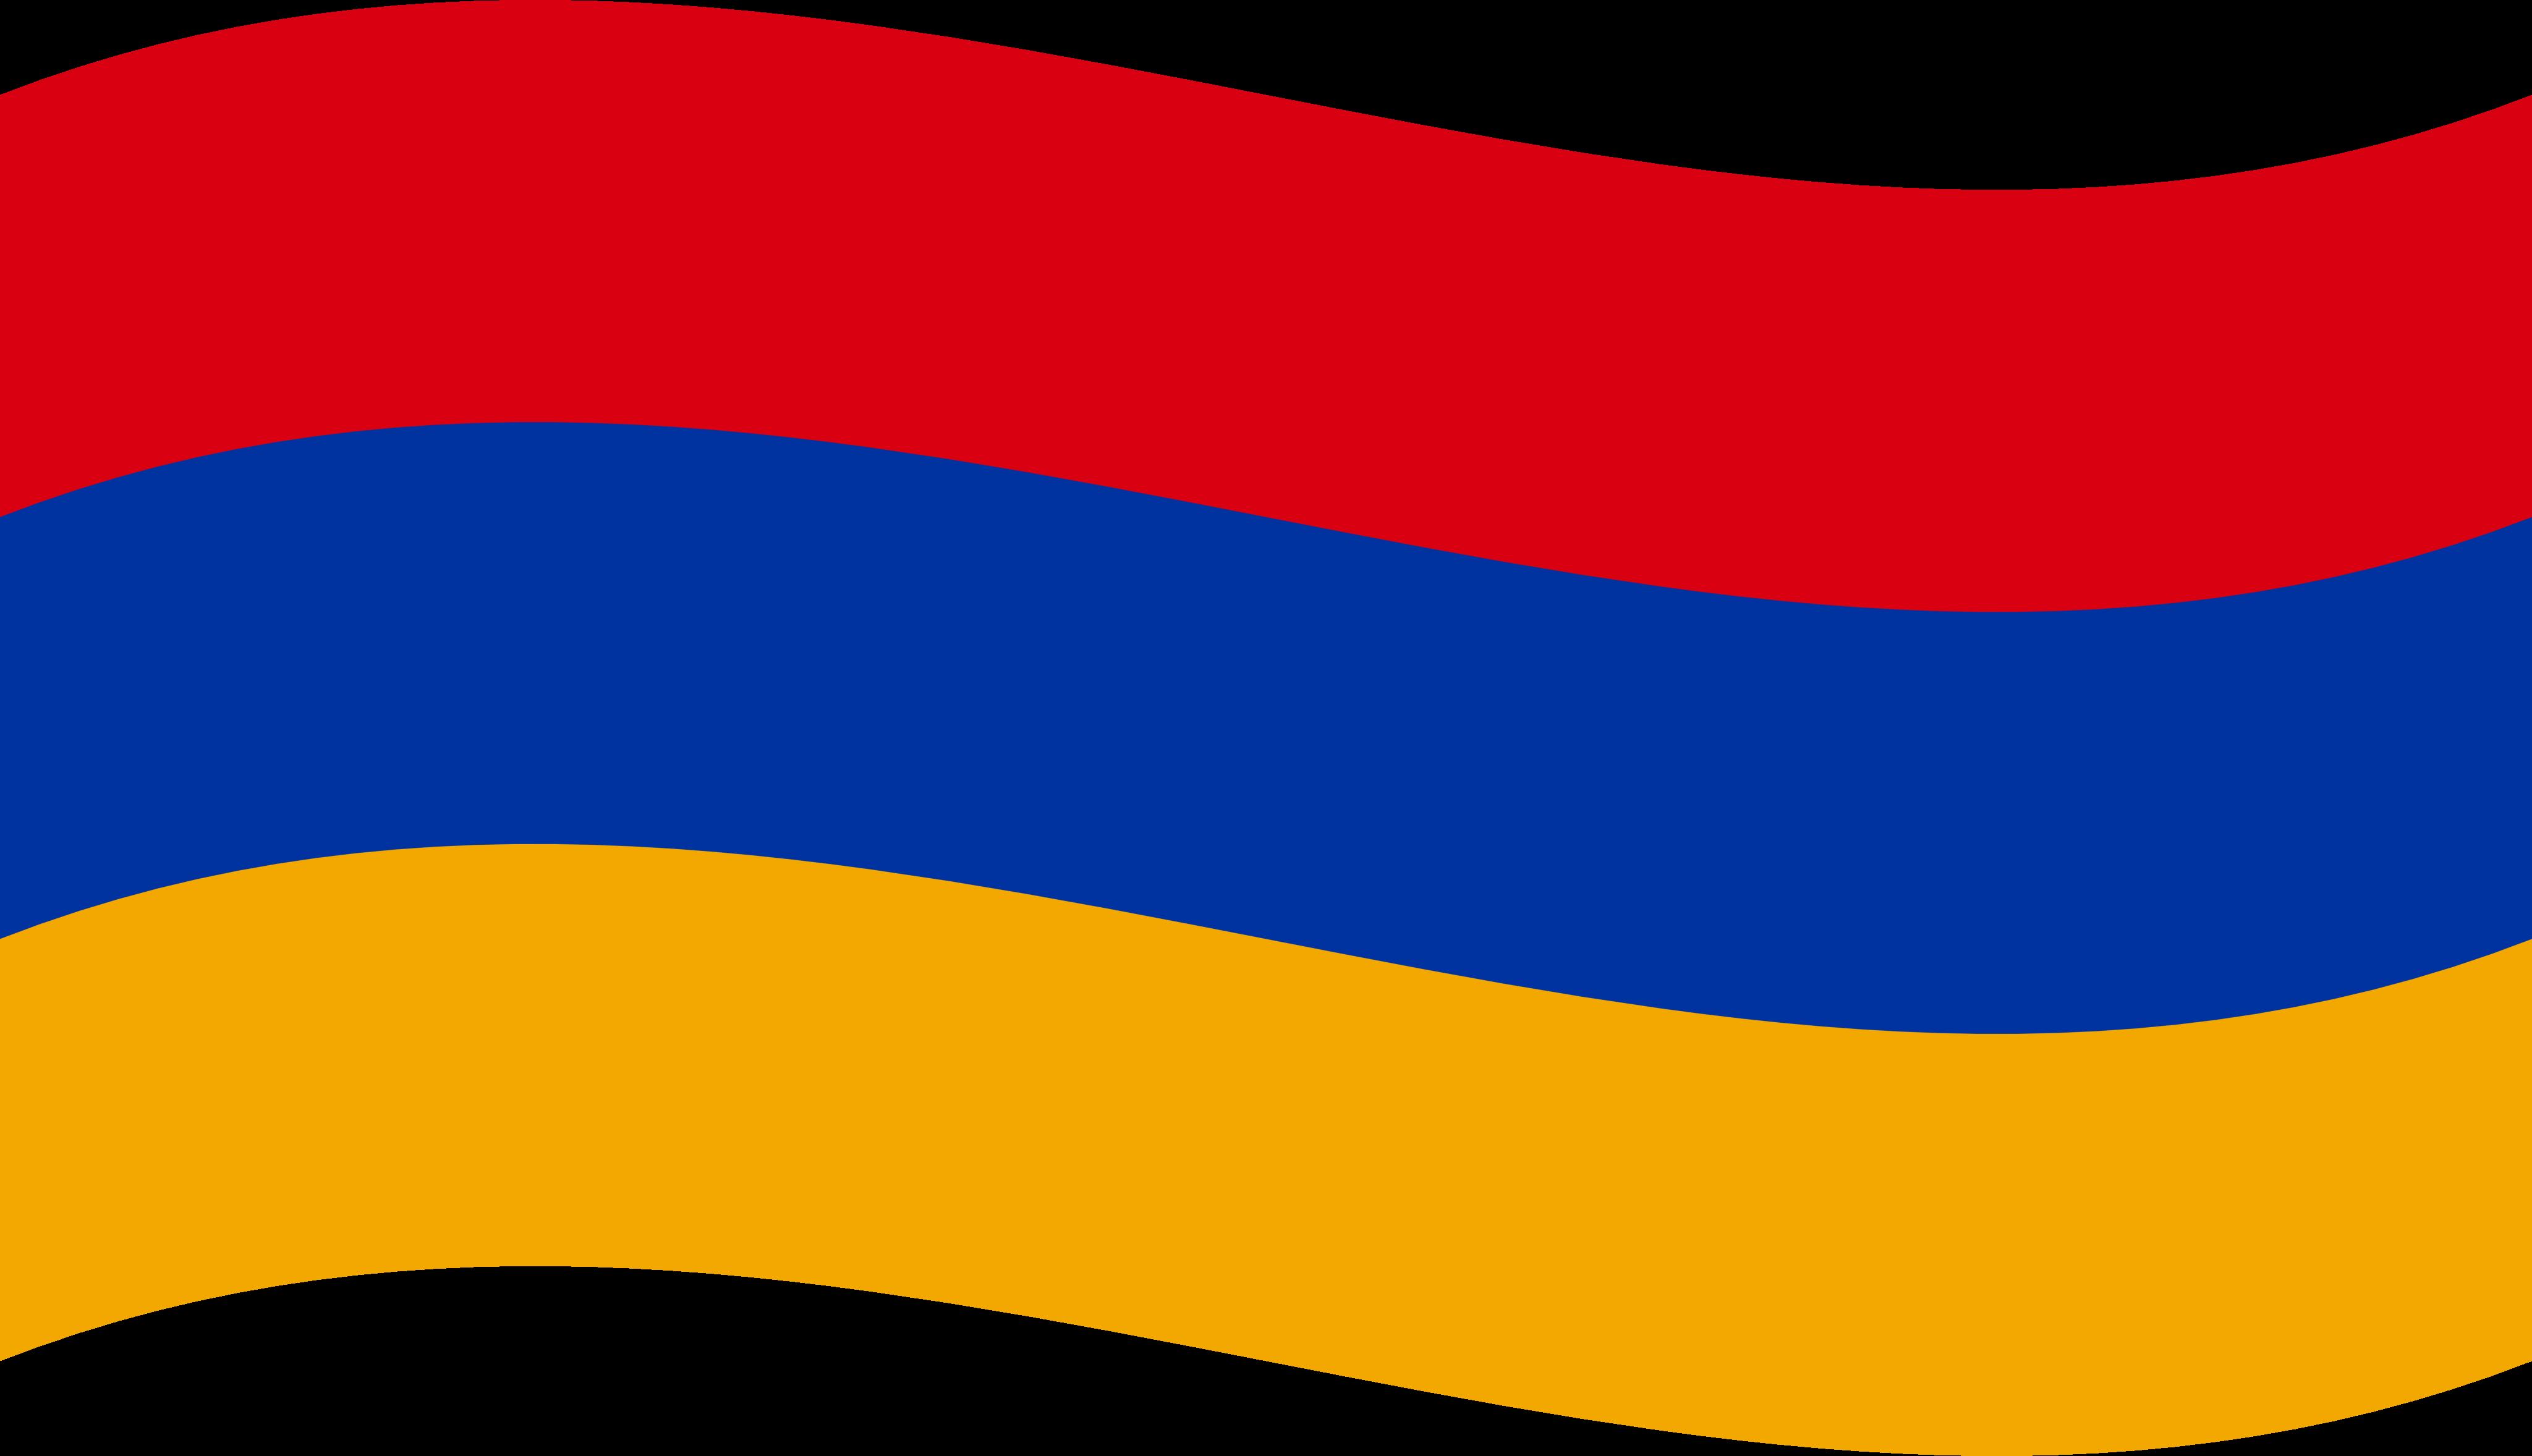 Flag Of Armenia Flag Download